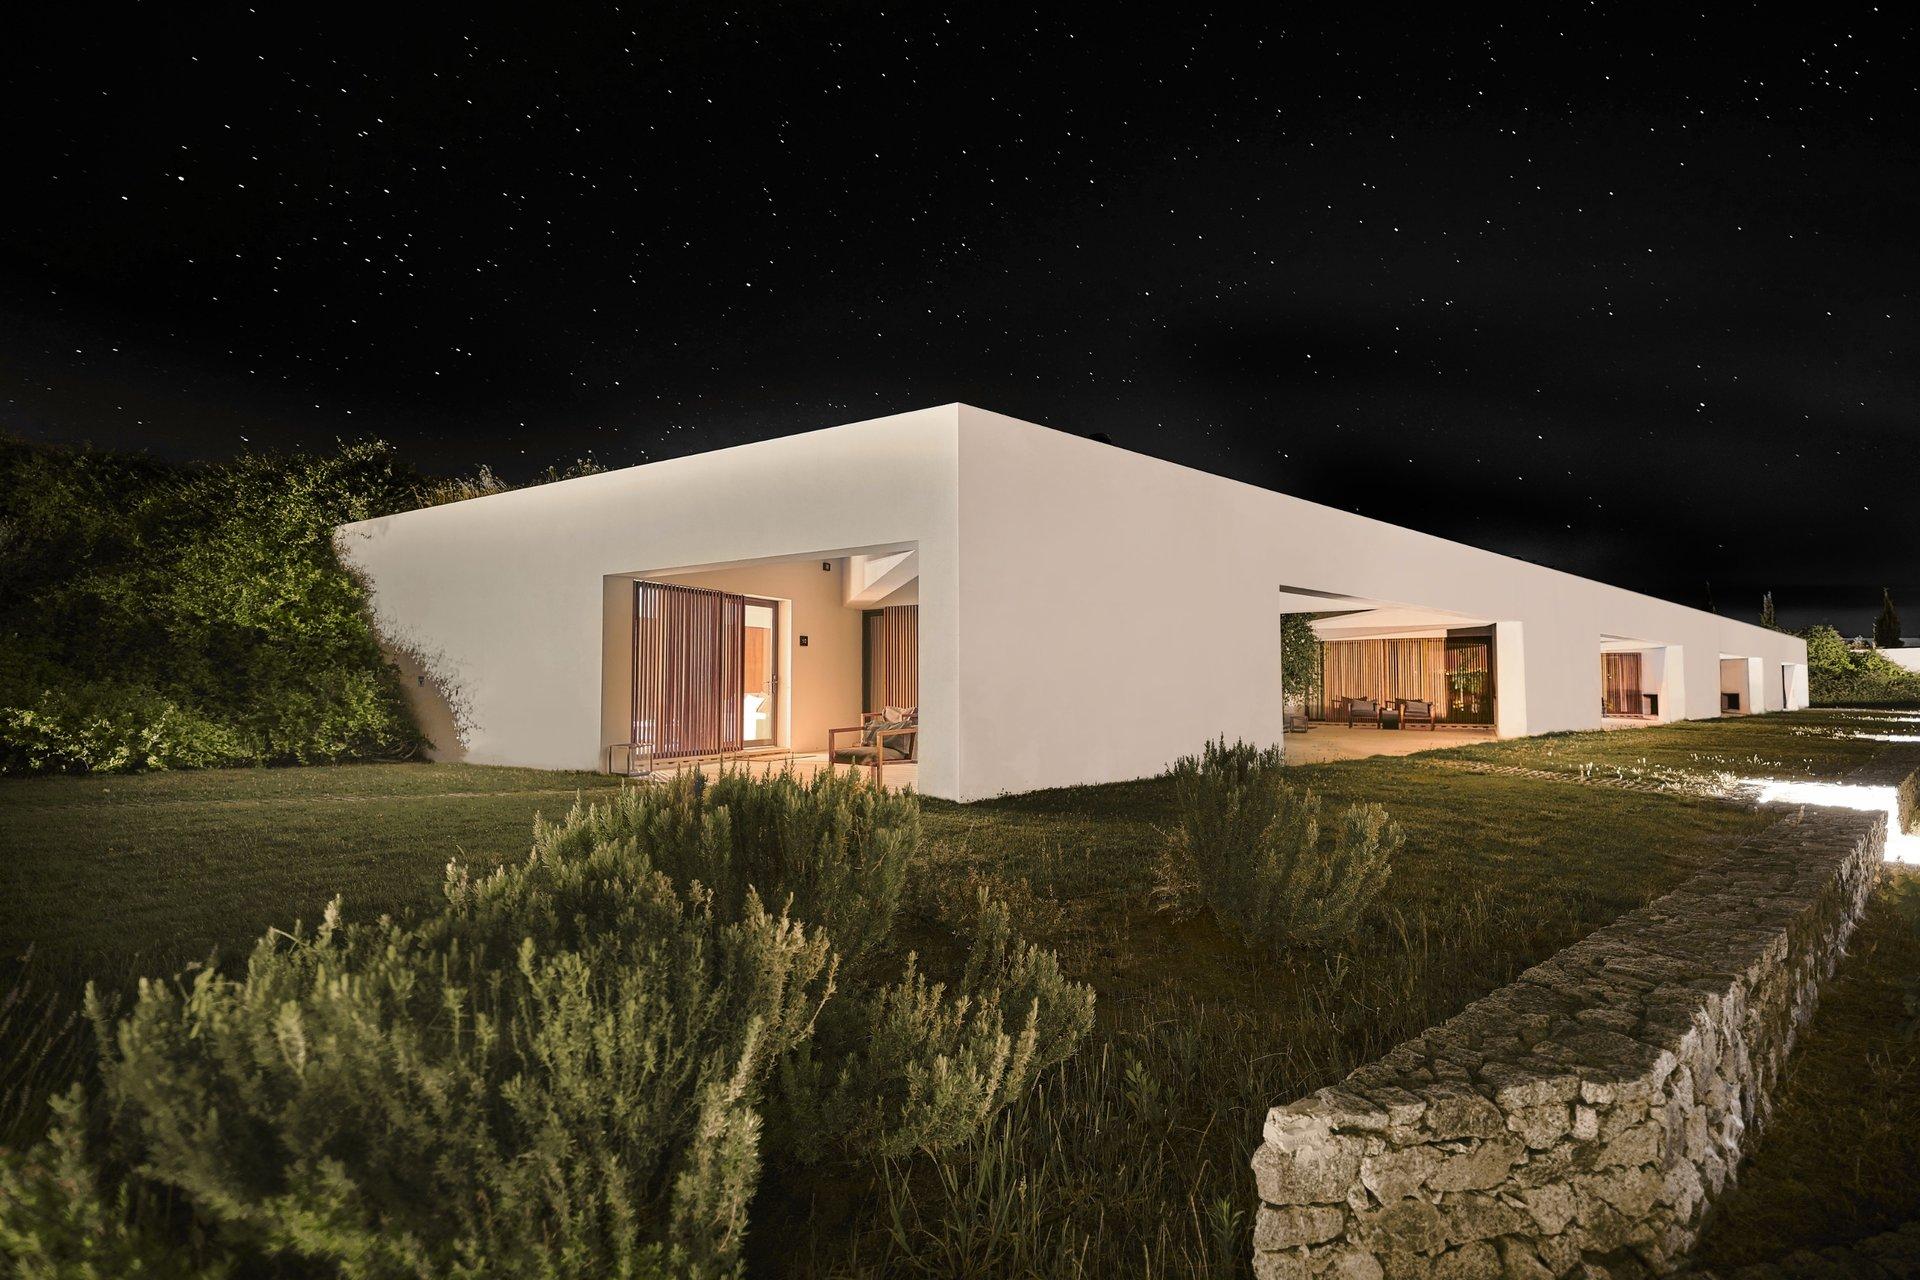 2 Bedroom Villa Montemor-o-Novo, Alentejo Ref: ASV192J